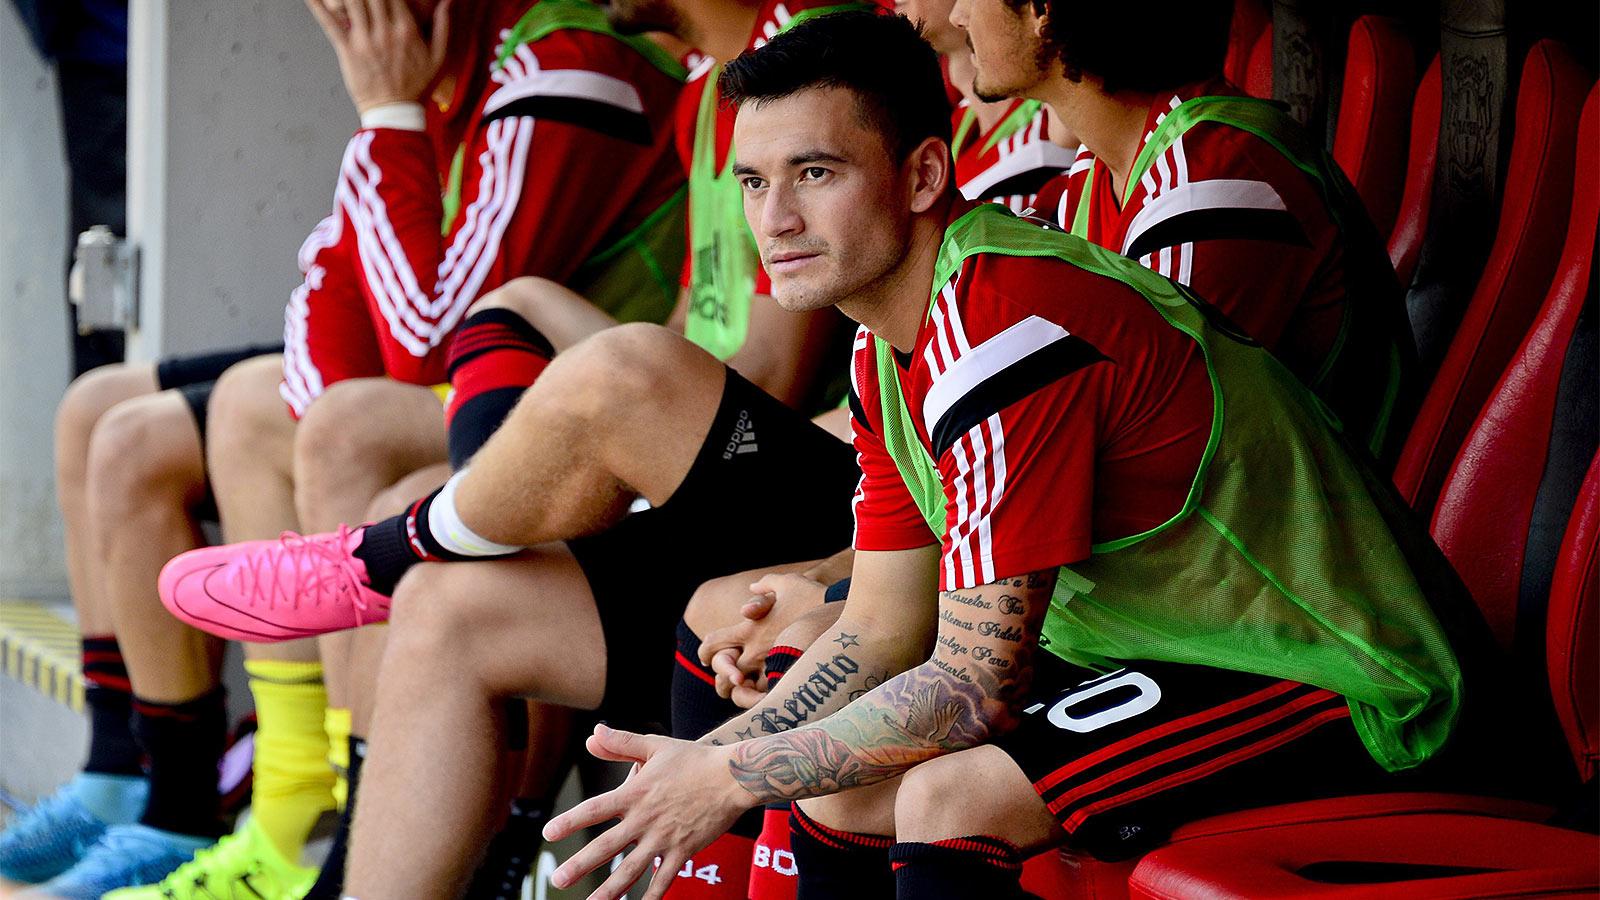 Bayer Leverkusen's new signing Charles Aranguiz out for months